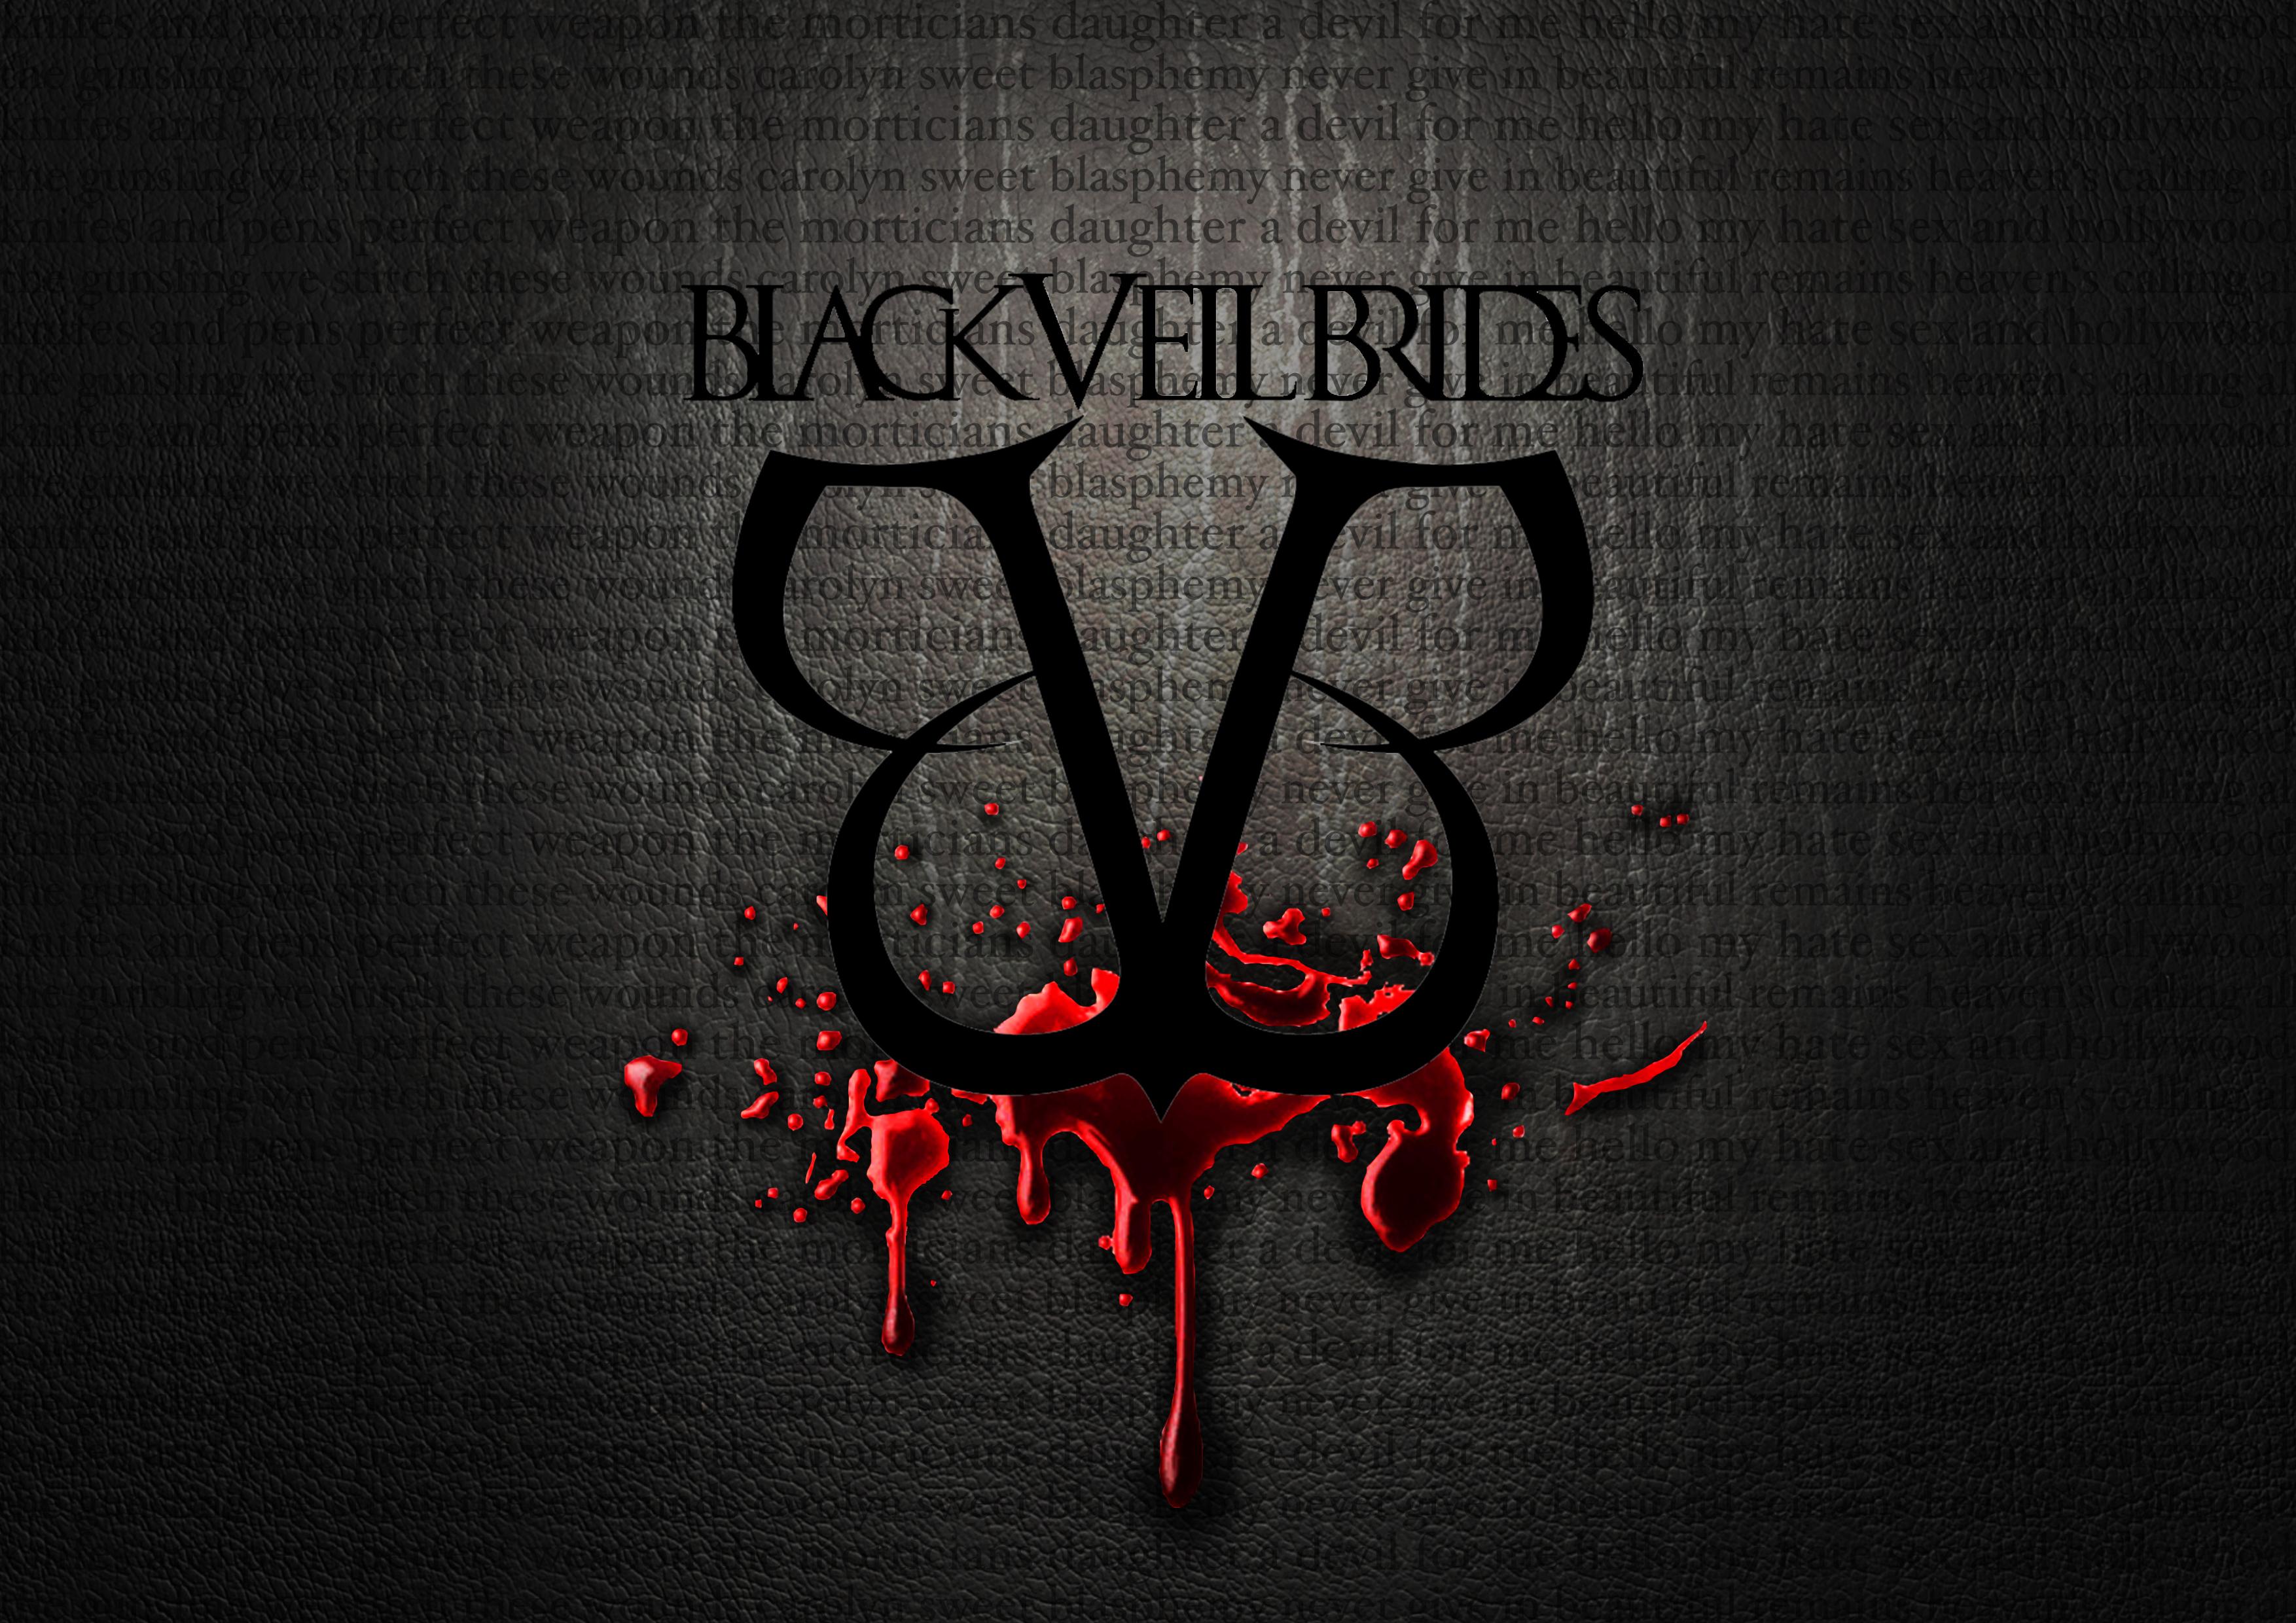 Black Veil Brides Fondo De Pantalla Hd Fondo De Escritorio